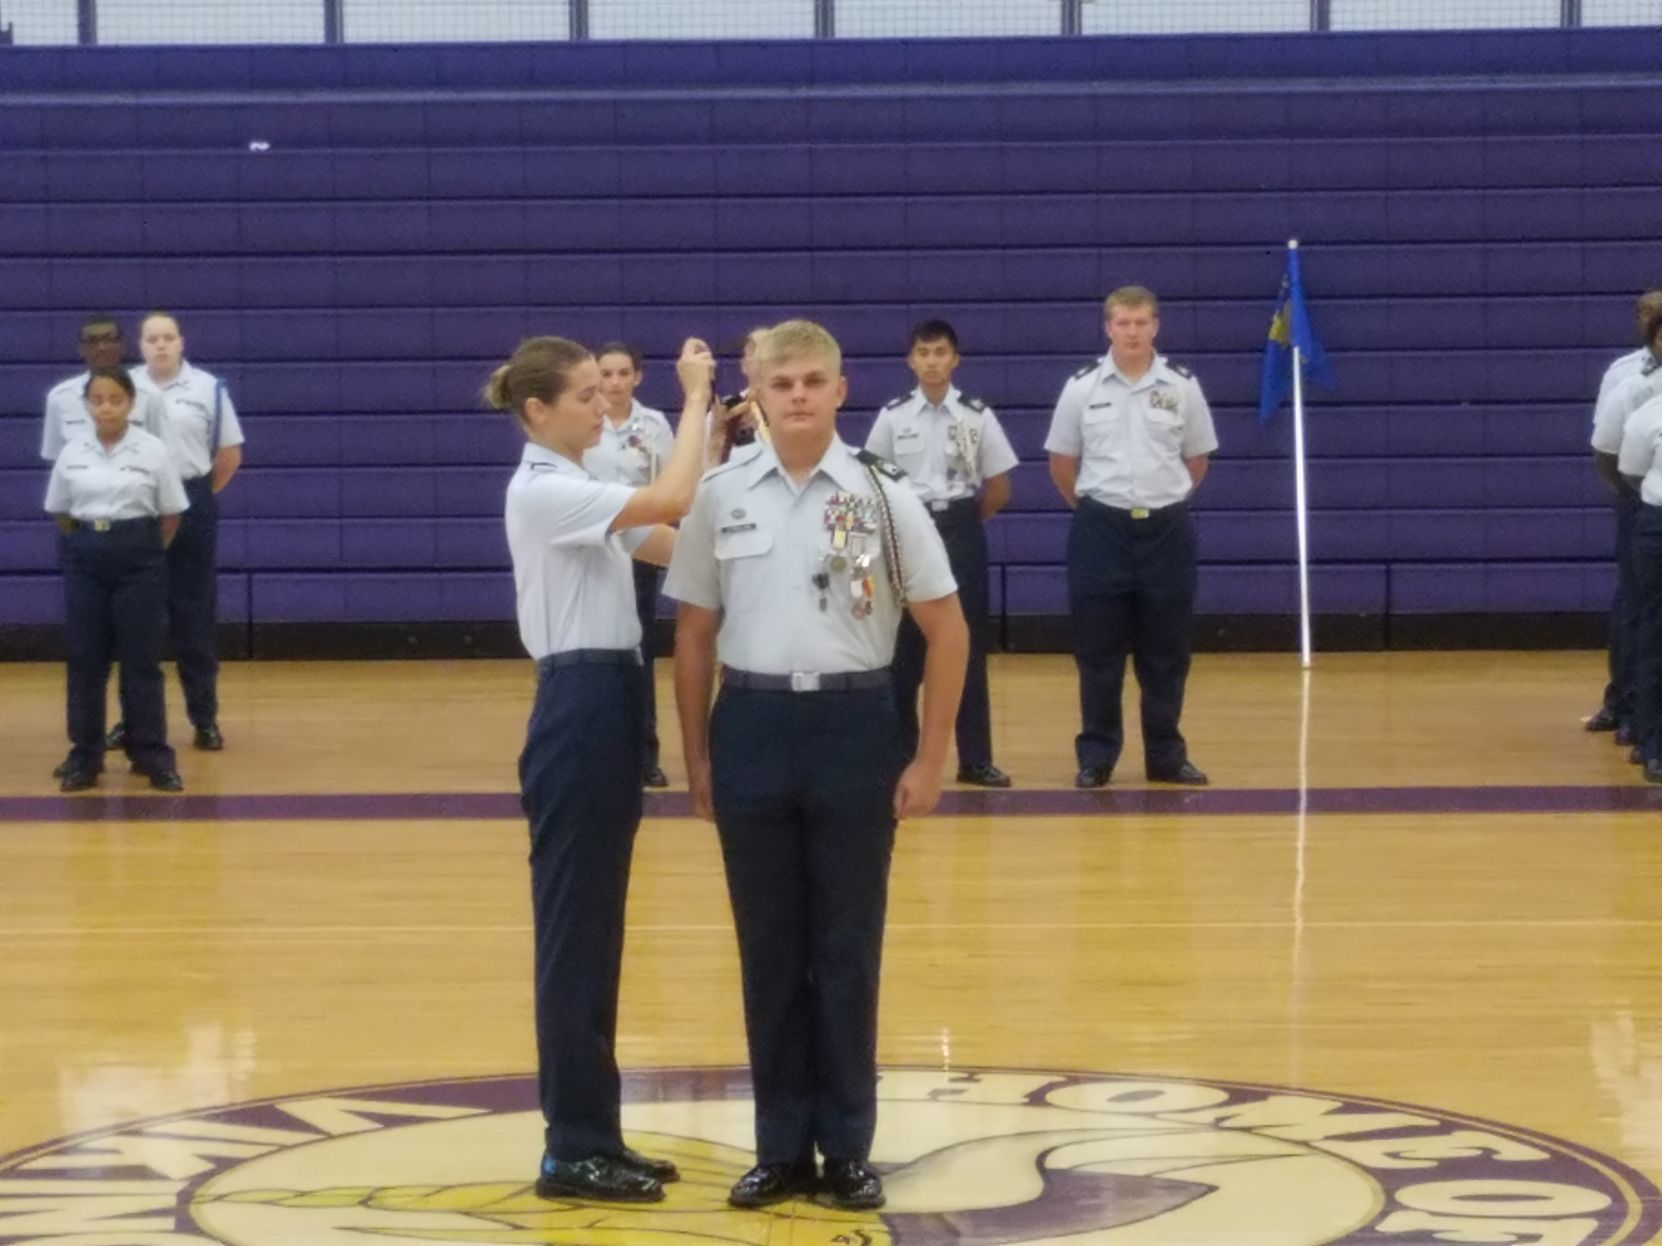 air force jrotc sons of confederate veterans